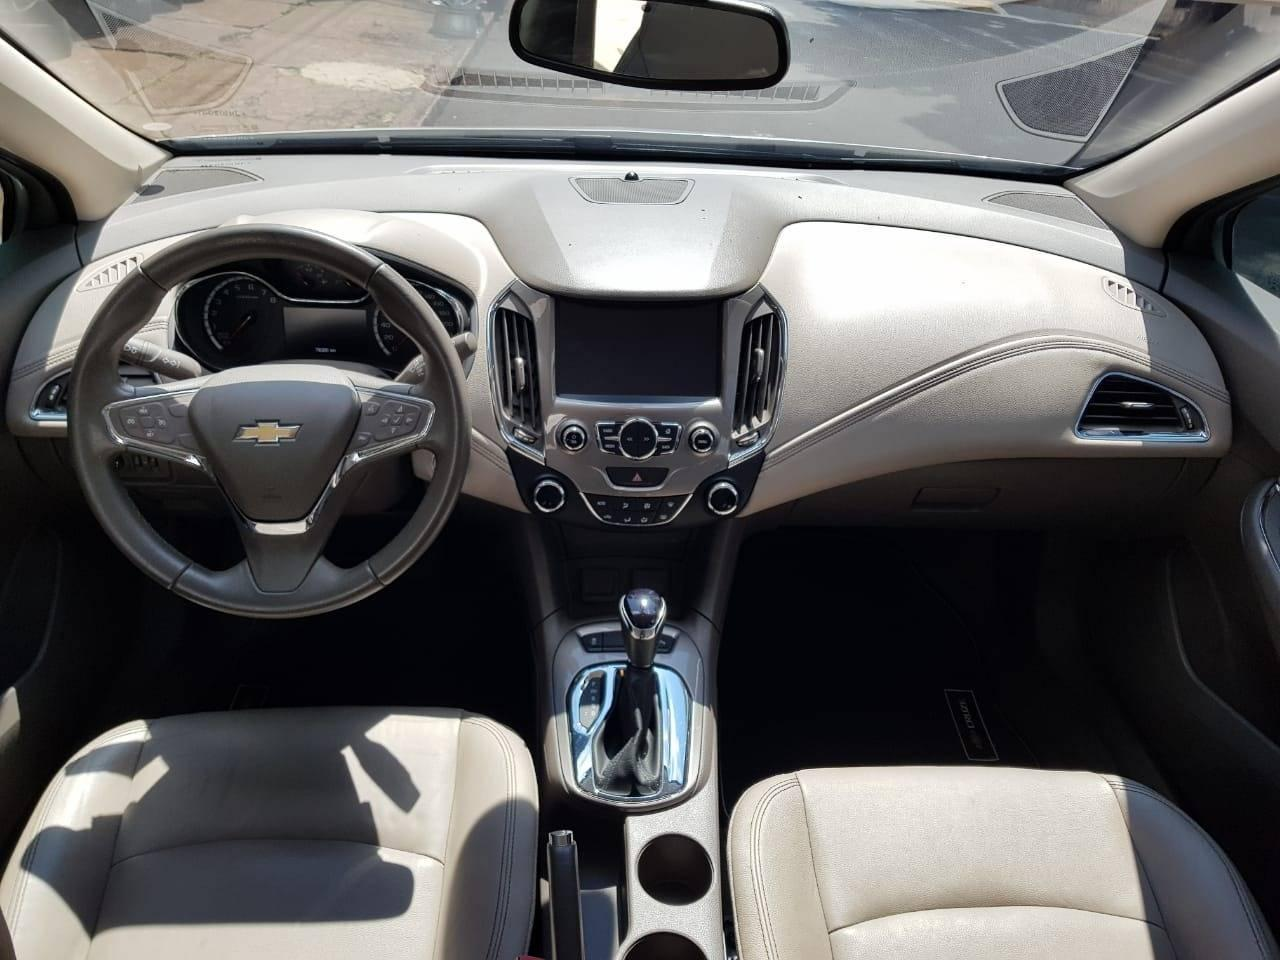 CHEVROLET Cruze Sedan 1.4 16V 4P LTZ FLEX TURBO AUTOMÁTICO, Foto 7